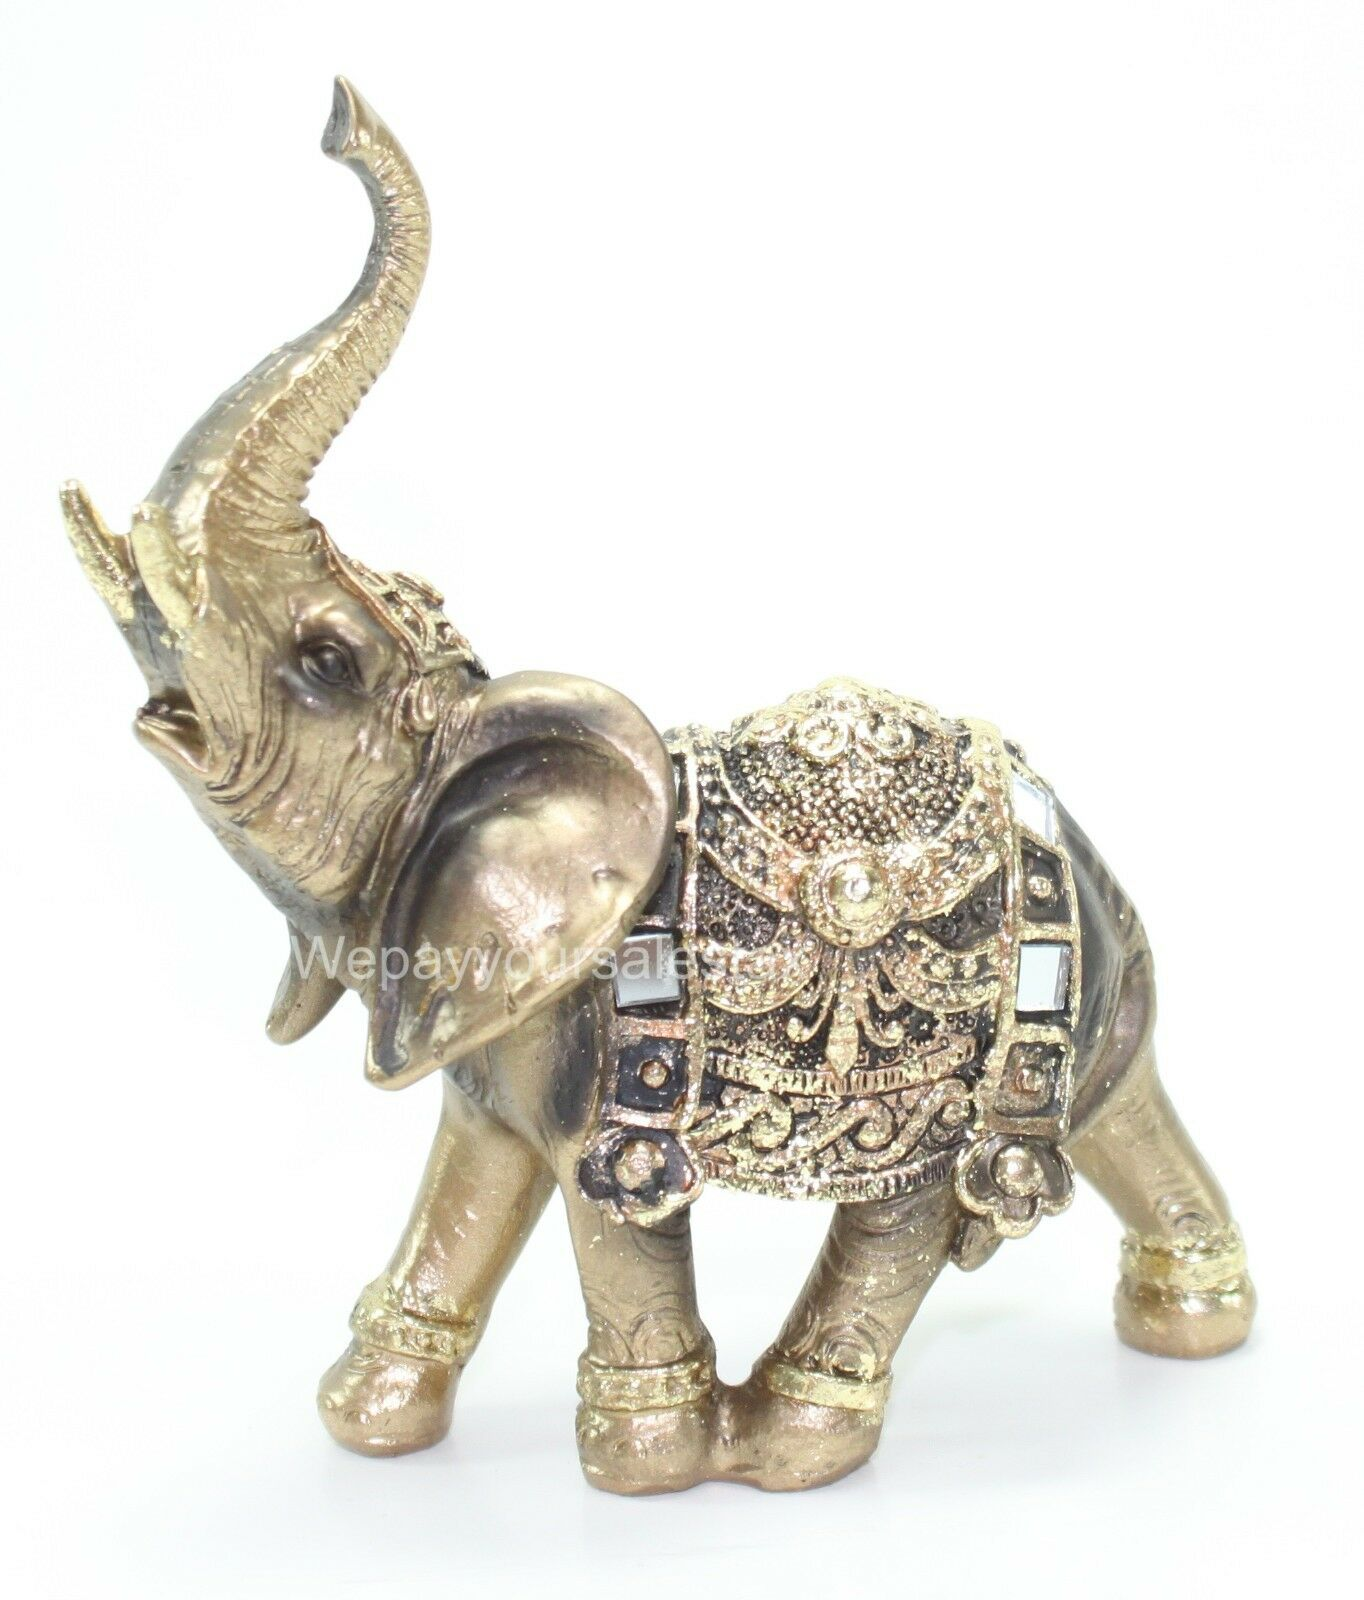 feng shui 4 5 elephant trunk statue wealth lucky figurine gift home decor ebay. Black Bedroom Furniture Sets. Home Design Ideas